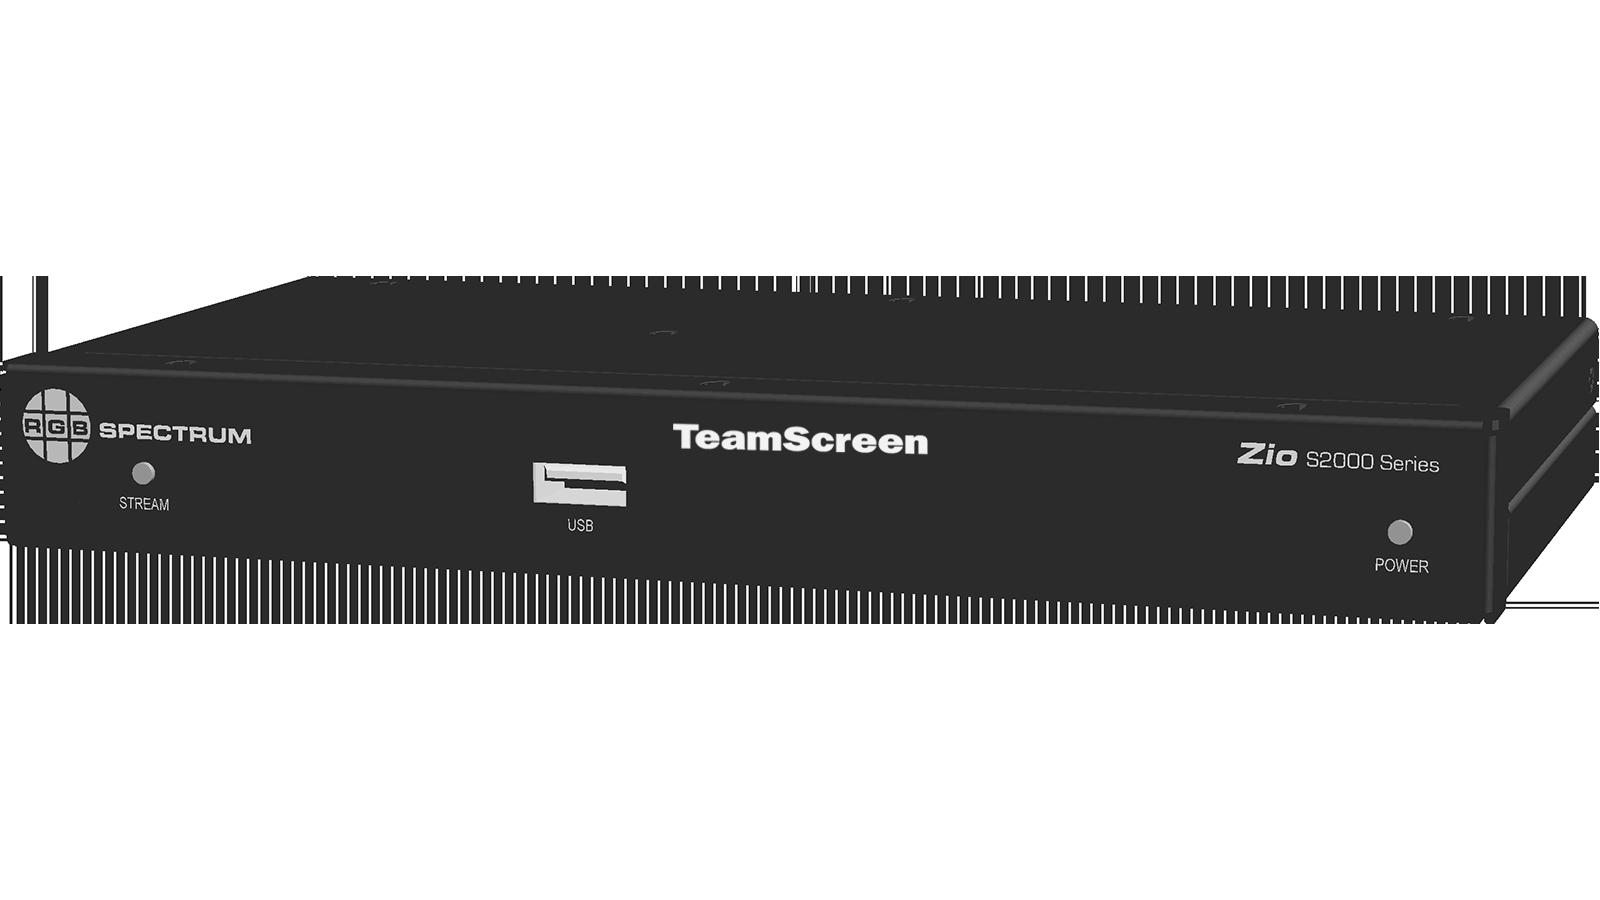 TeamScreen S2000 front